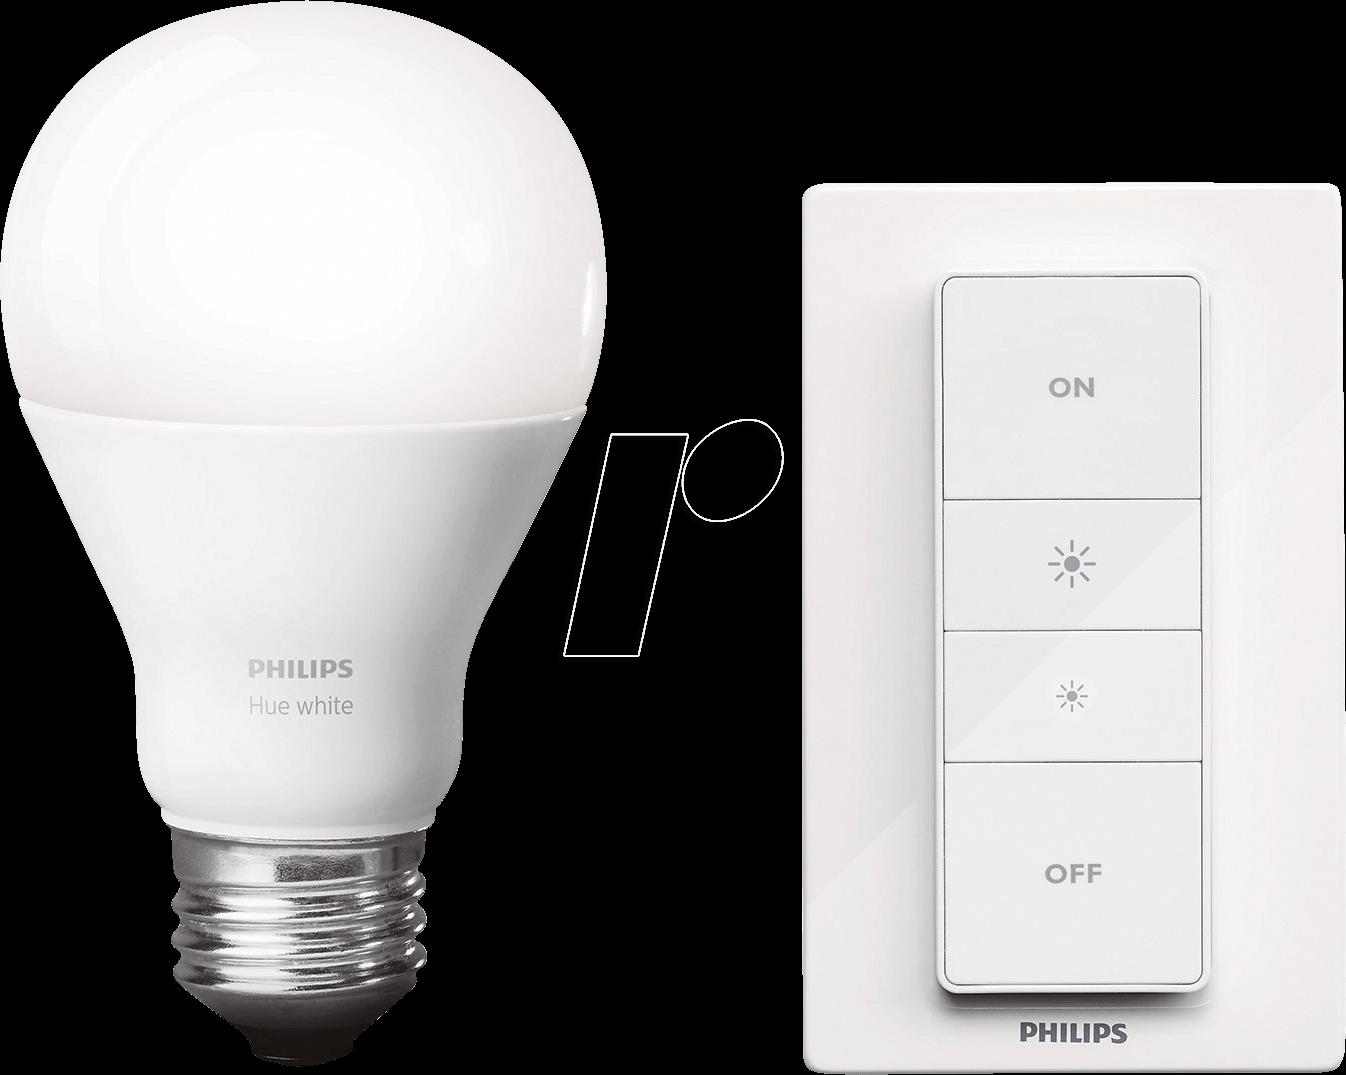 Stroomverbruik Hue Lampen : Phi smart light hue wireless dimming kit e eec a